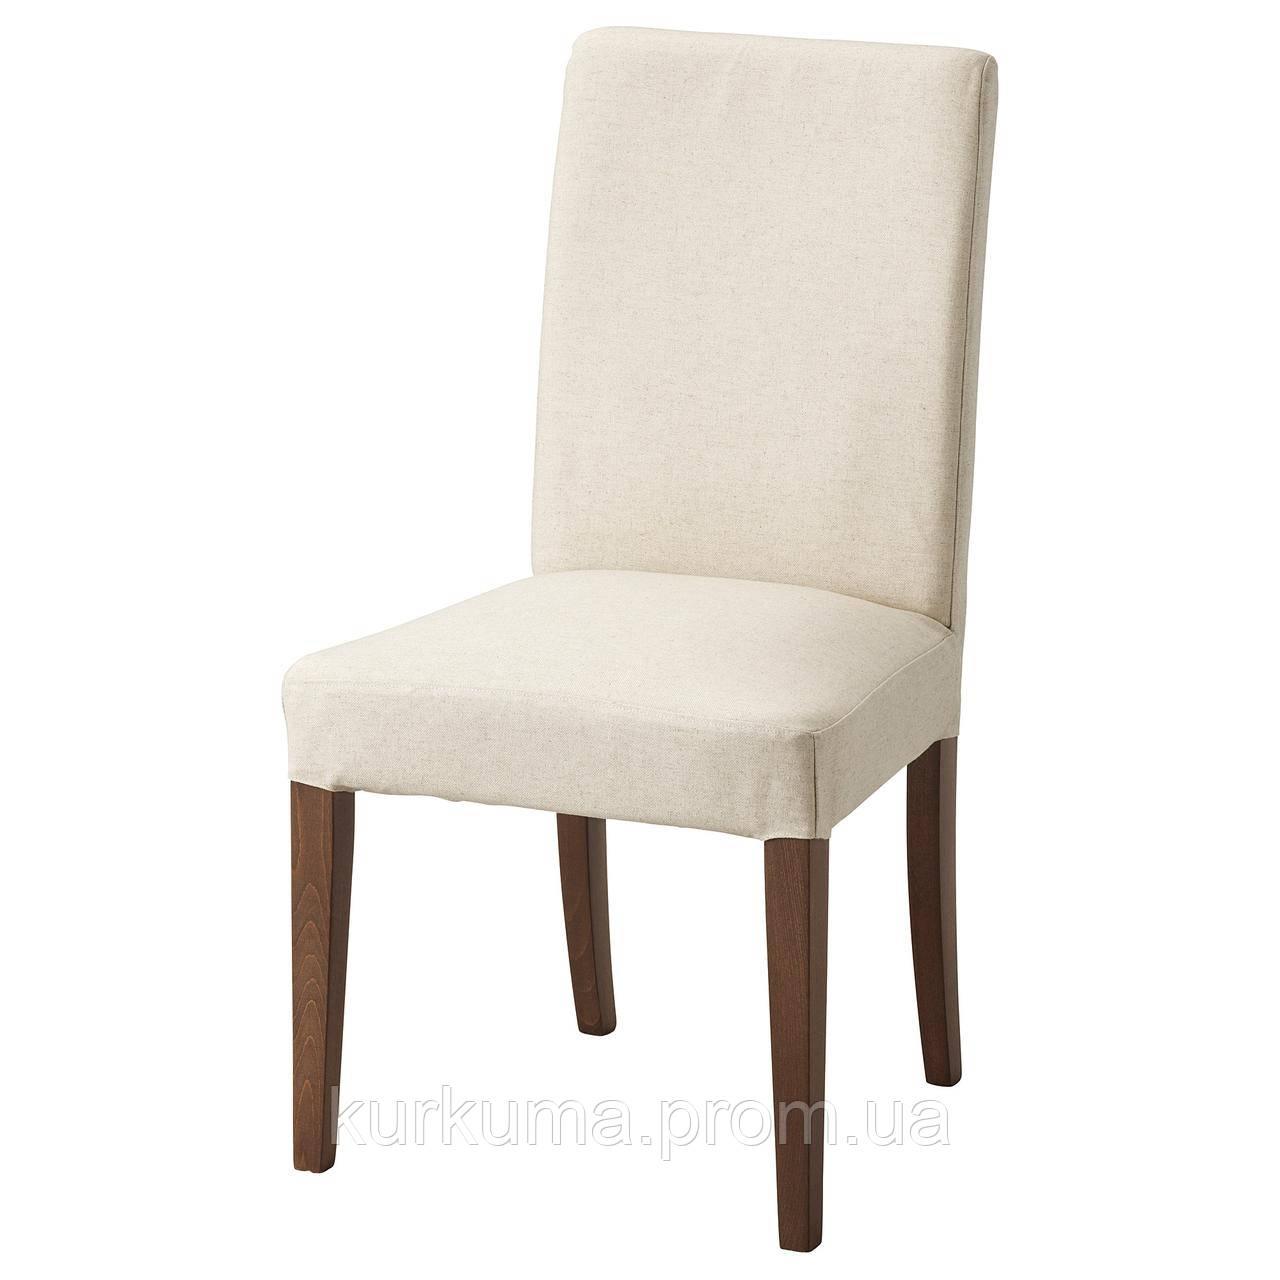 IKEA HENRIKSDAL Стул коричневый, натуральный linneryd  (092.208.18)